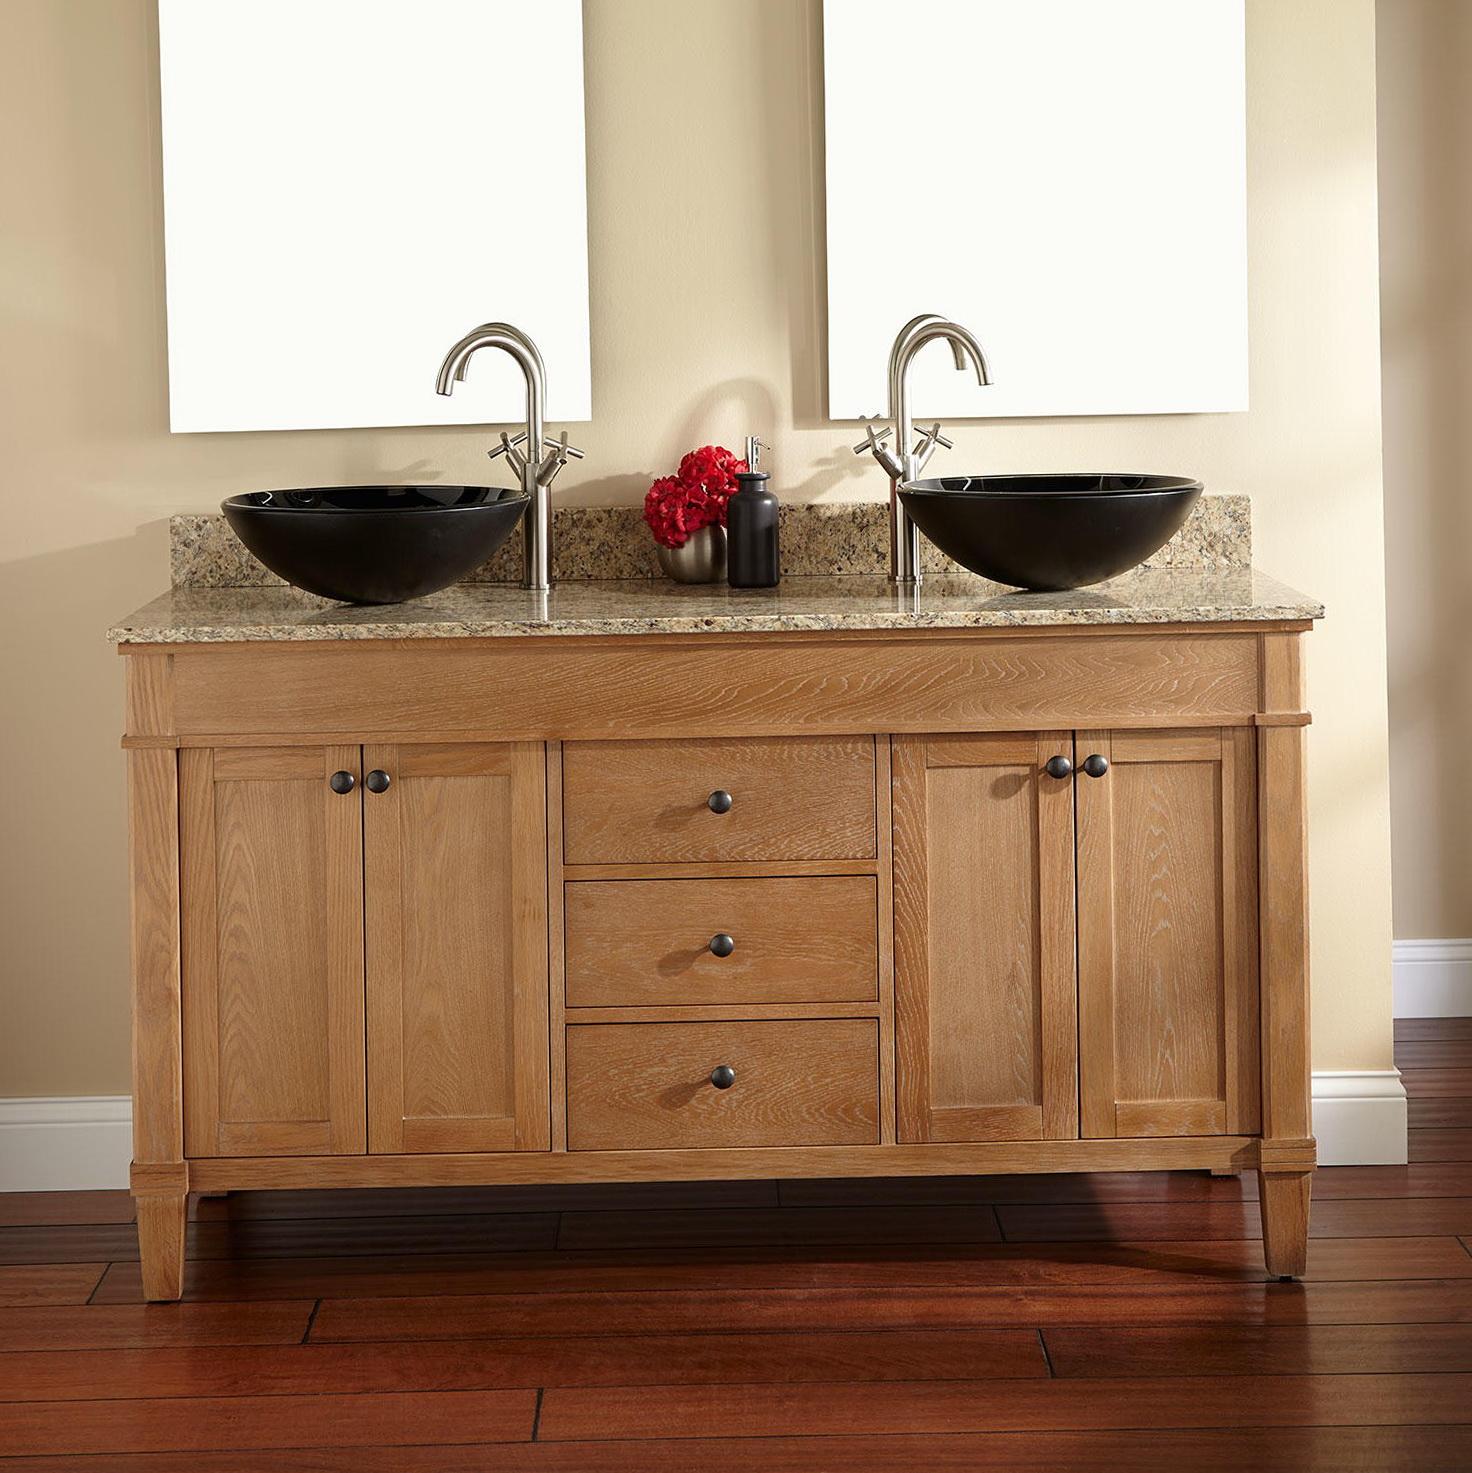 Bathroom Double Vanity Plumbing Diagram Home Design Ideas